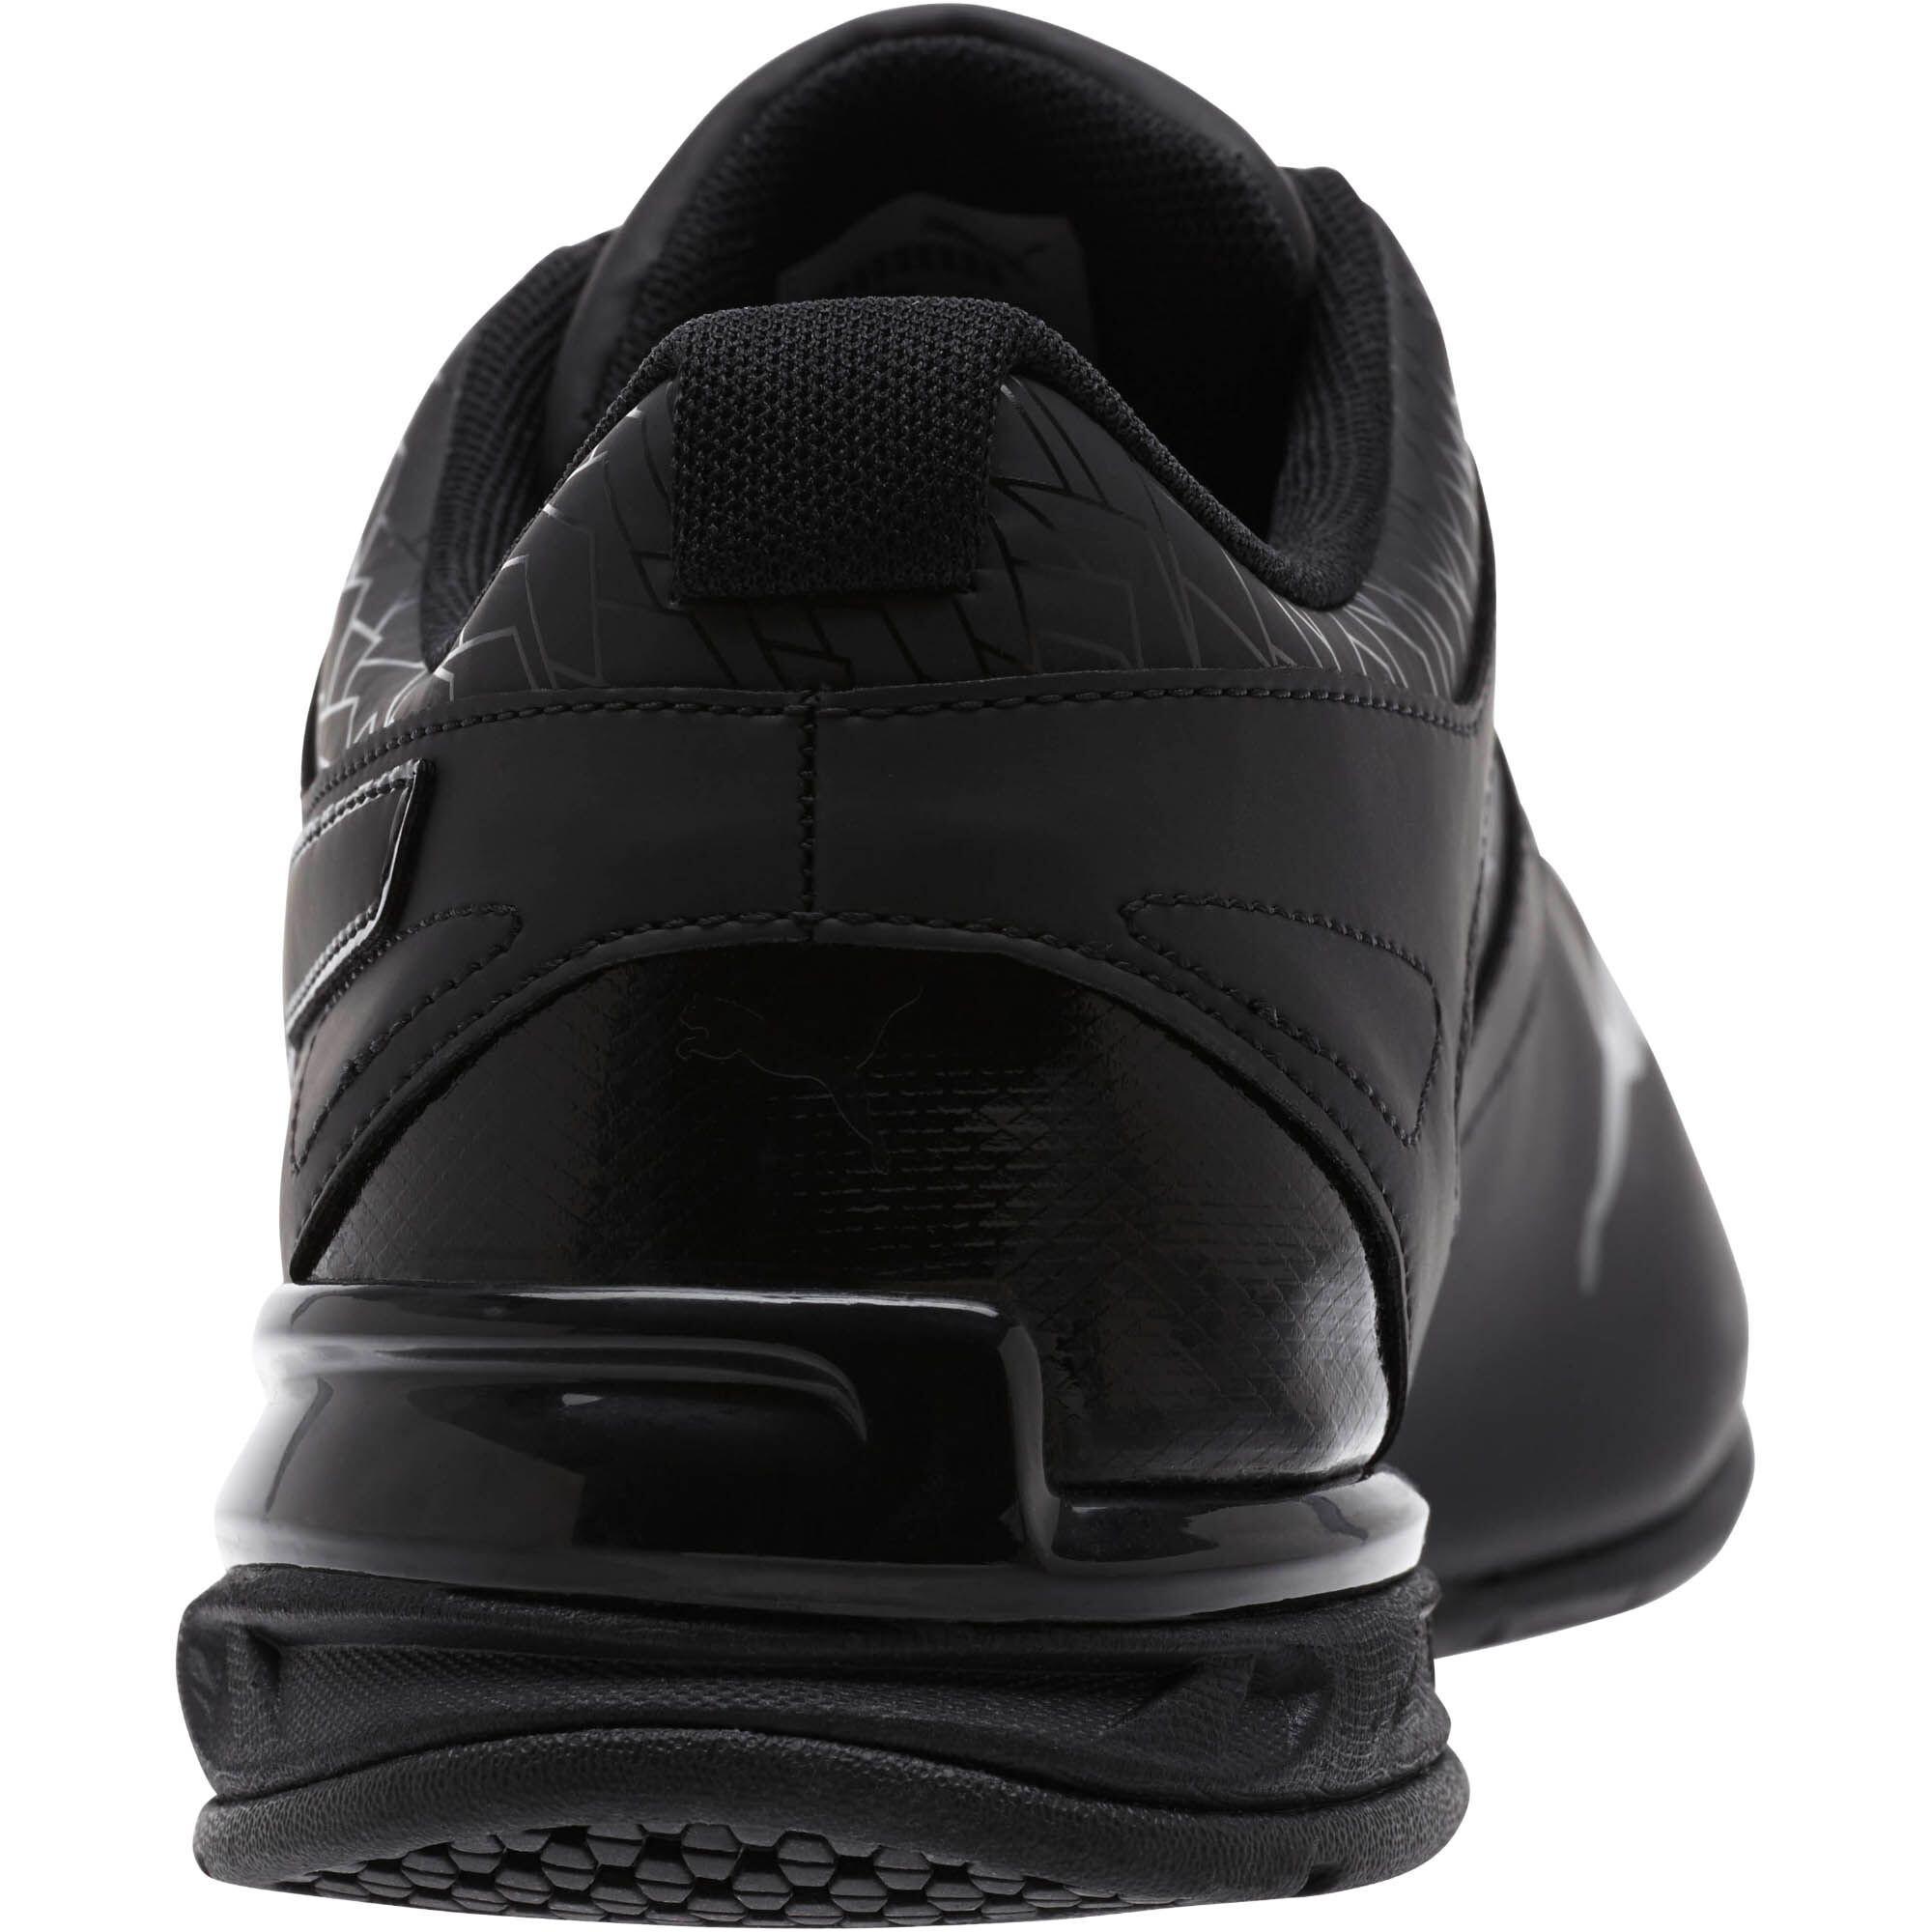 thumbnail 10 - PUMA Men's Tazon 6 Fracture FM Sneakers